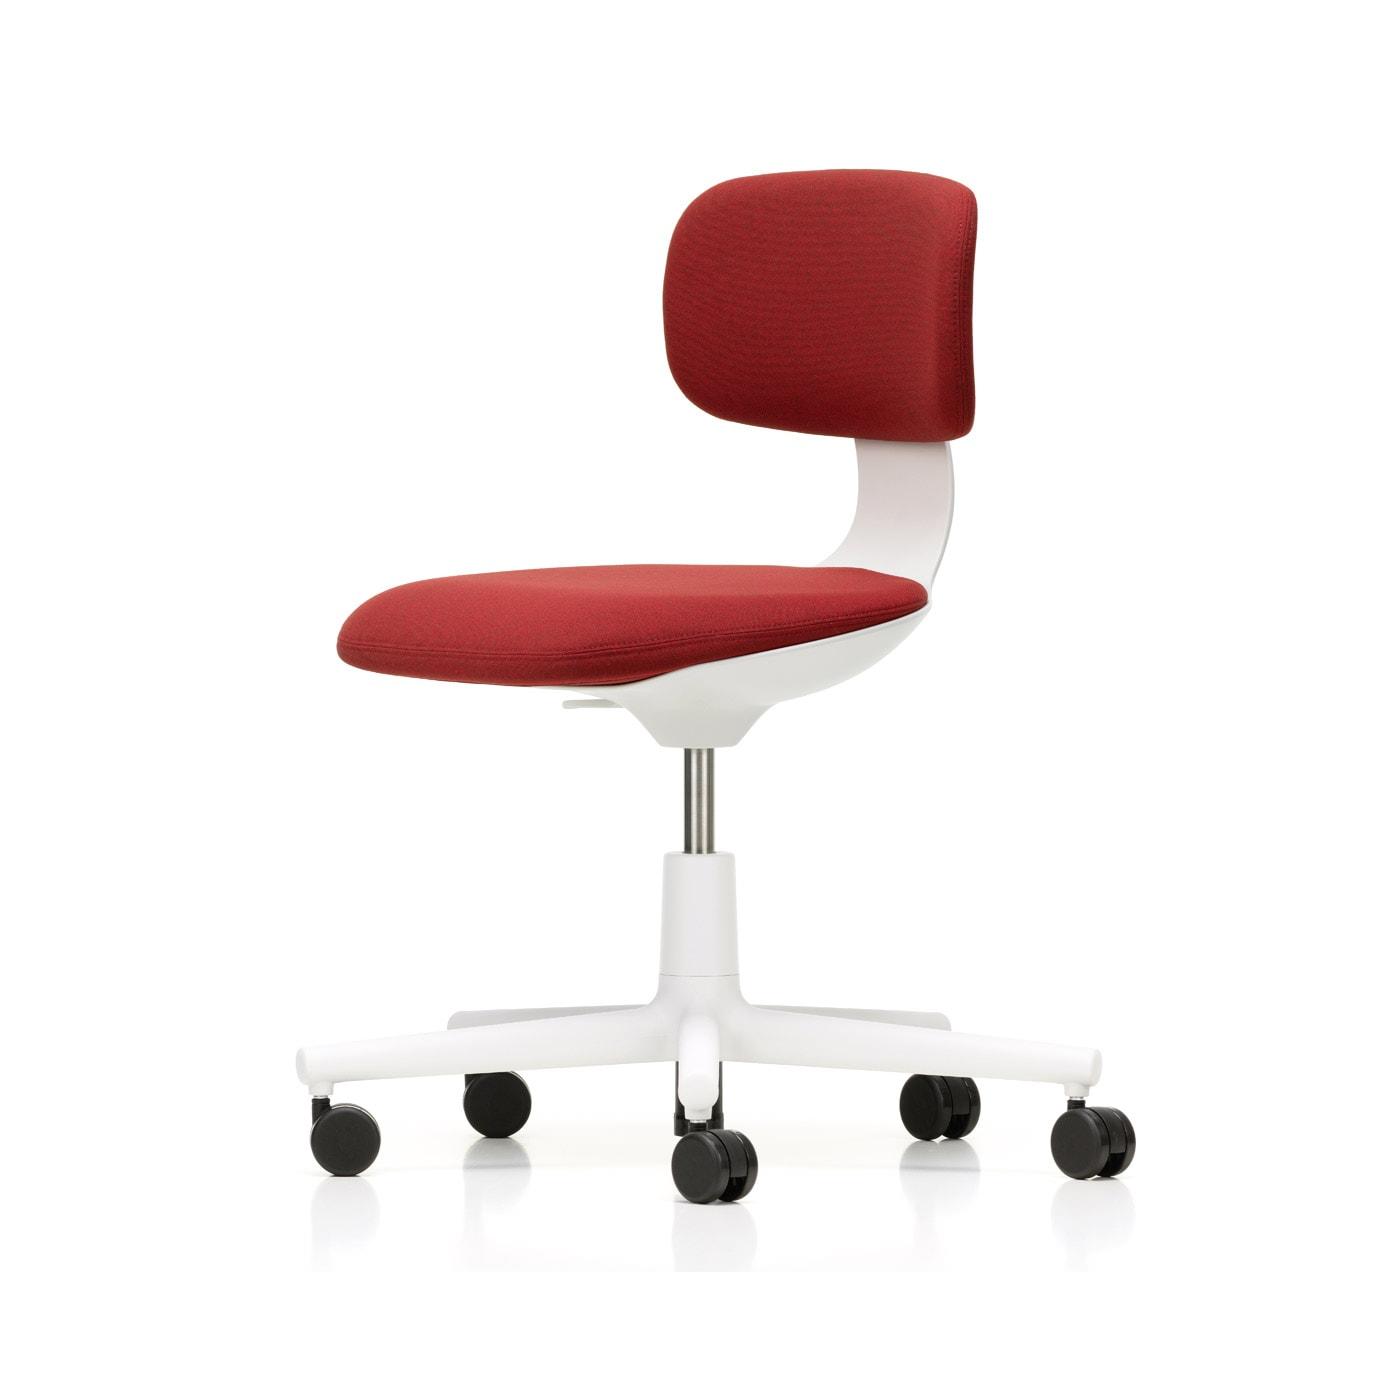 Vitra rookie sedia ufficio girevole